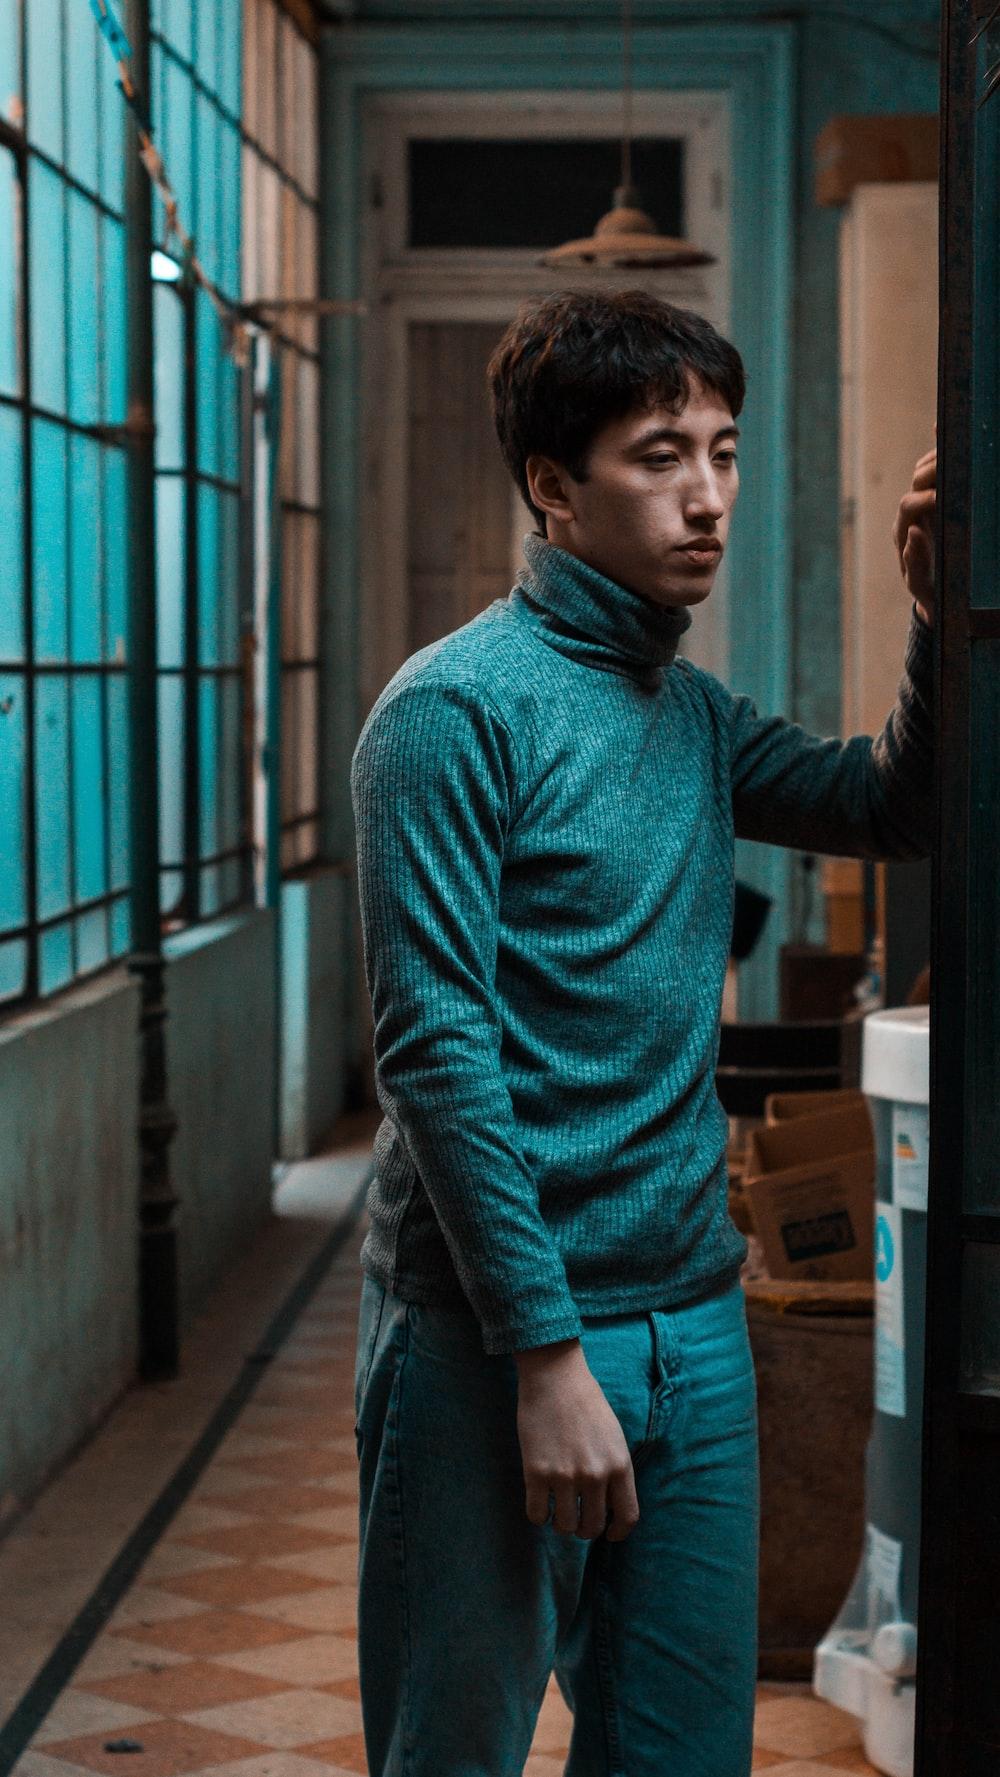 men's gray turtle neck sweater